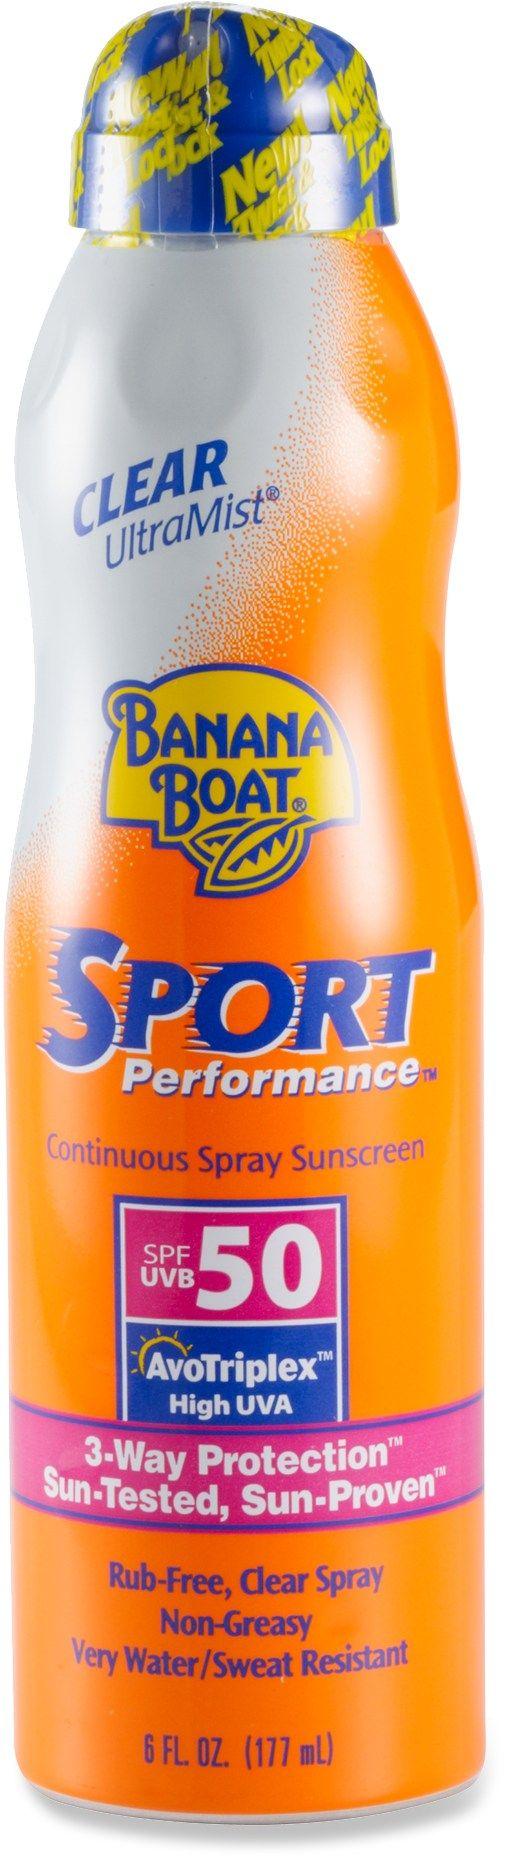 Banana Boat Sport Performance Ultramist Spray Sunscreen - Spf 50